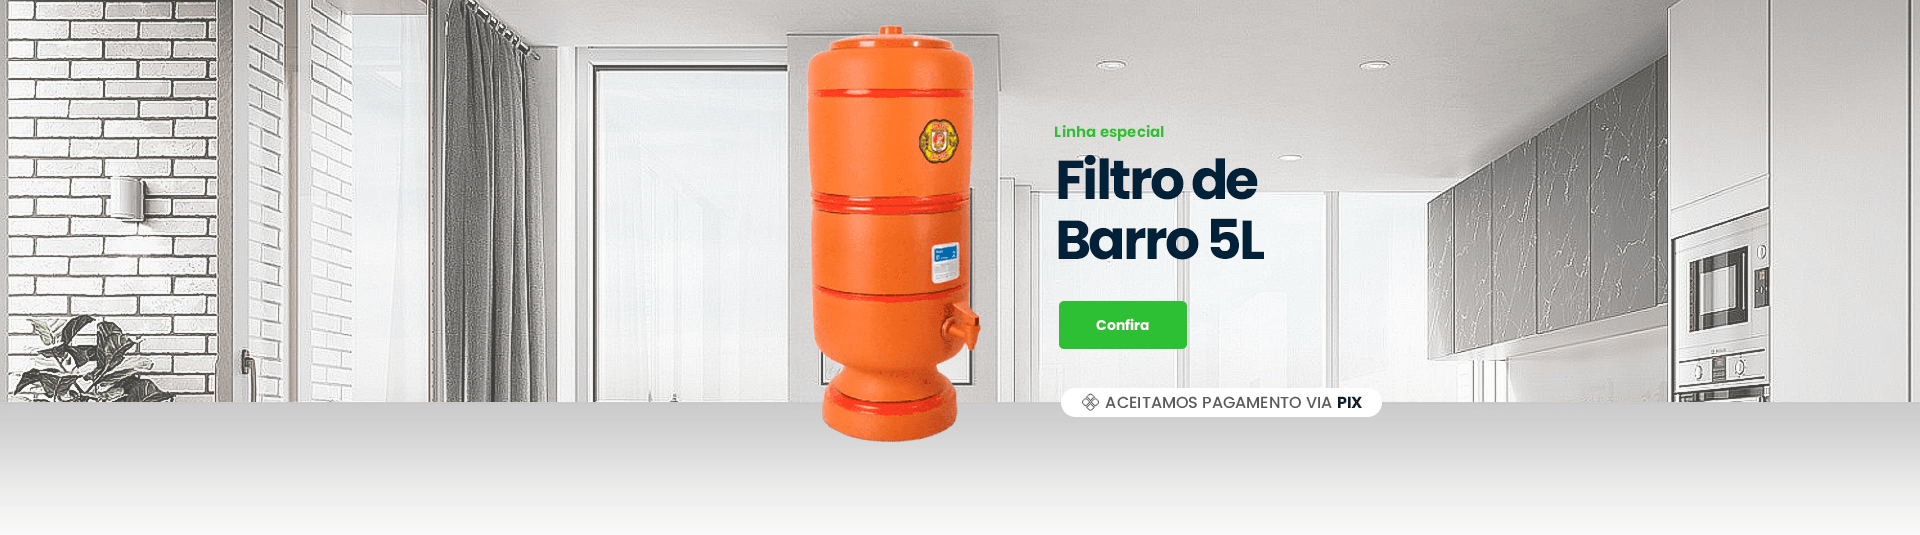 Filtro de Barro 5L (Santa Maria)